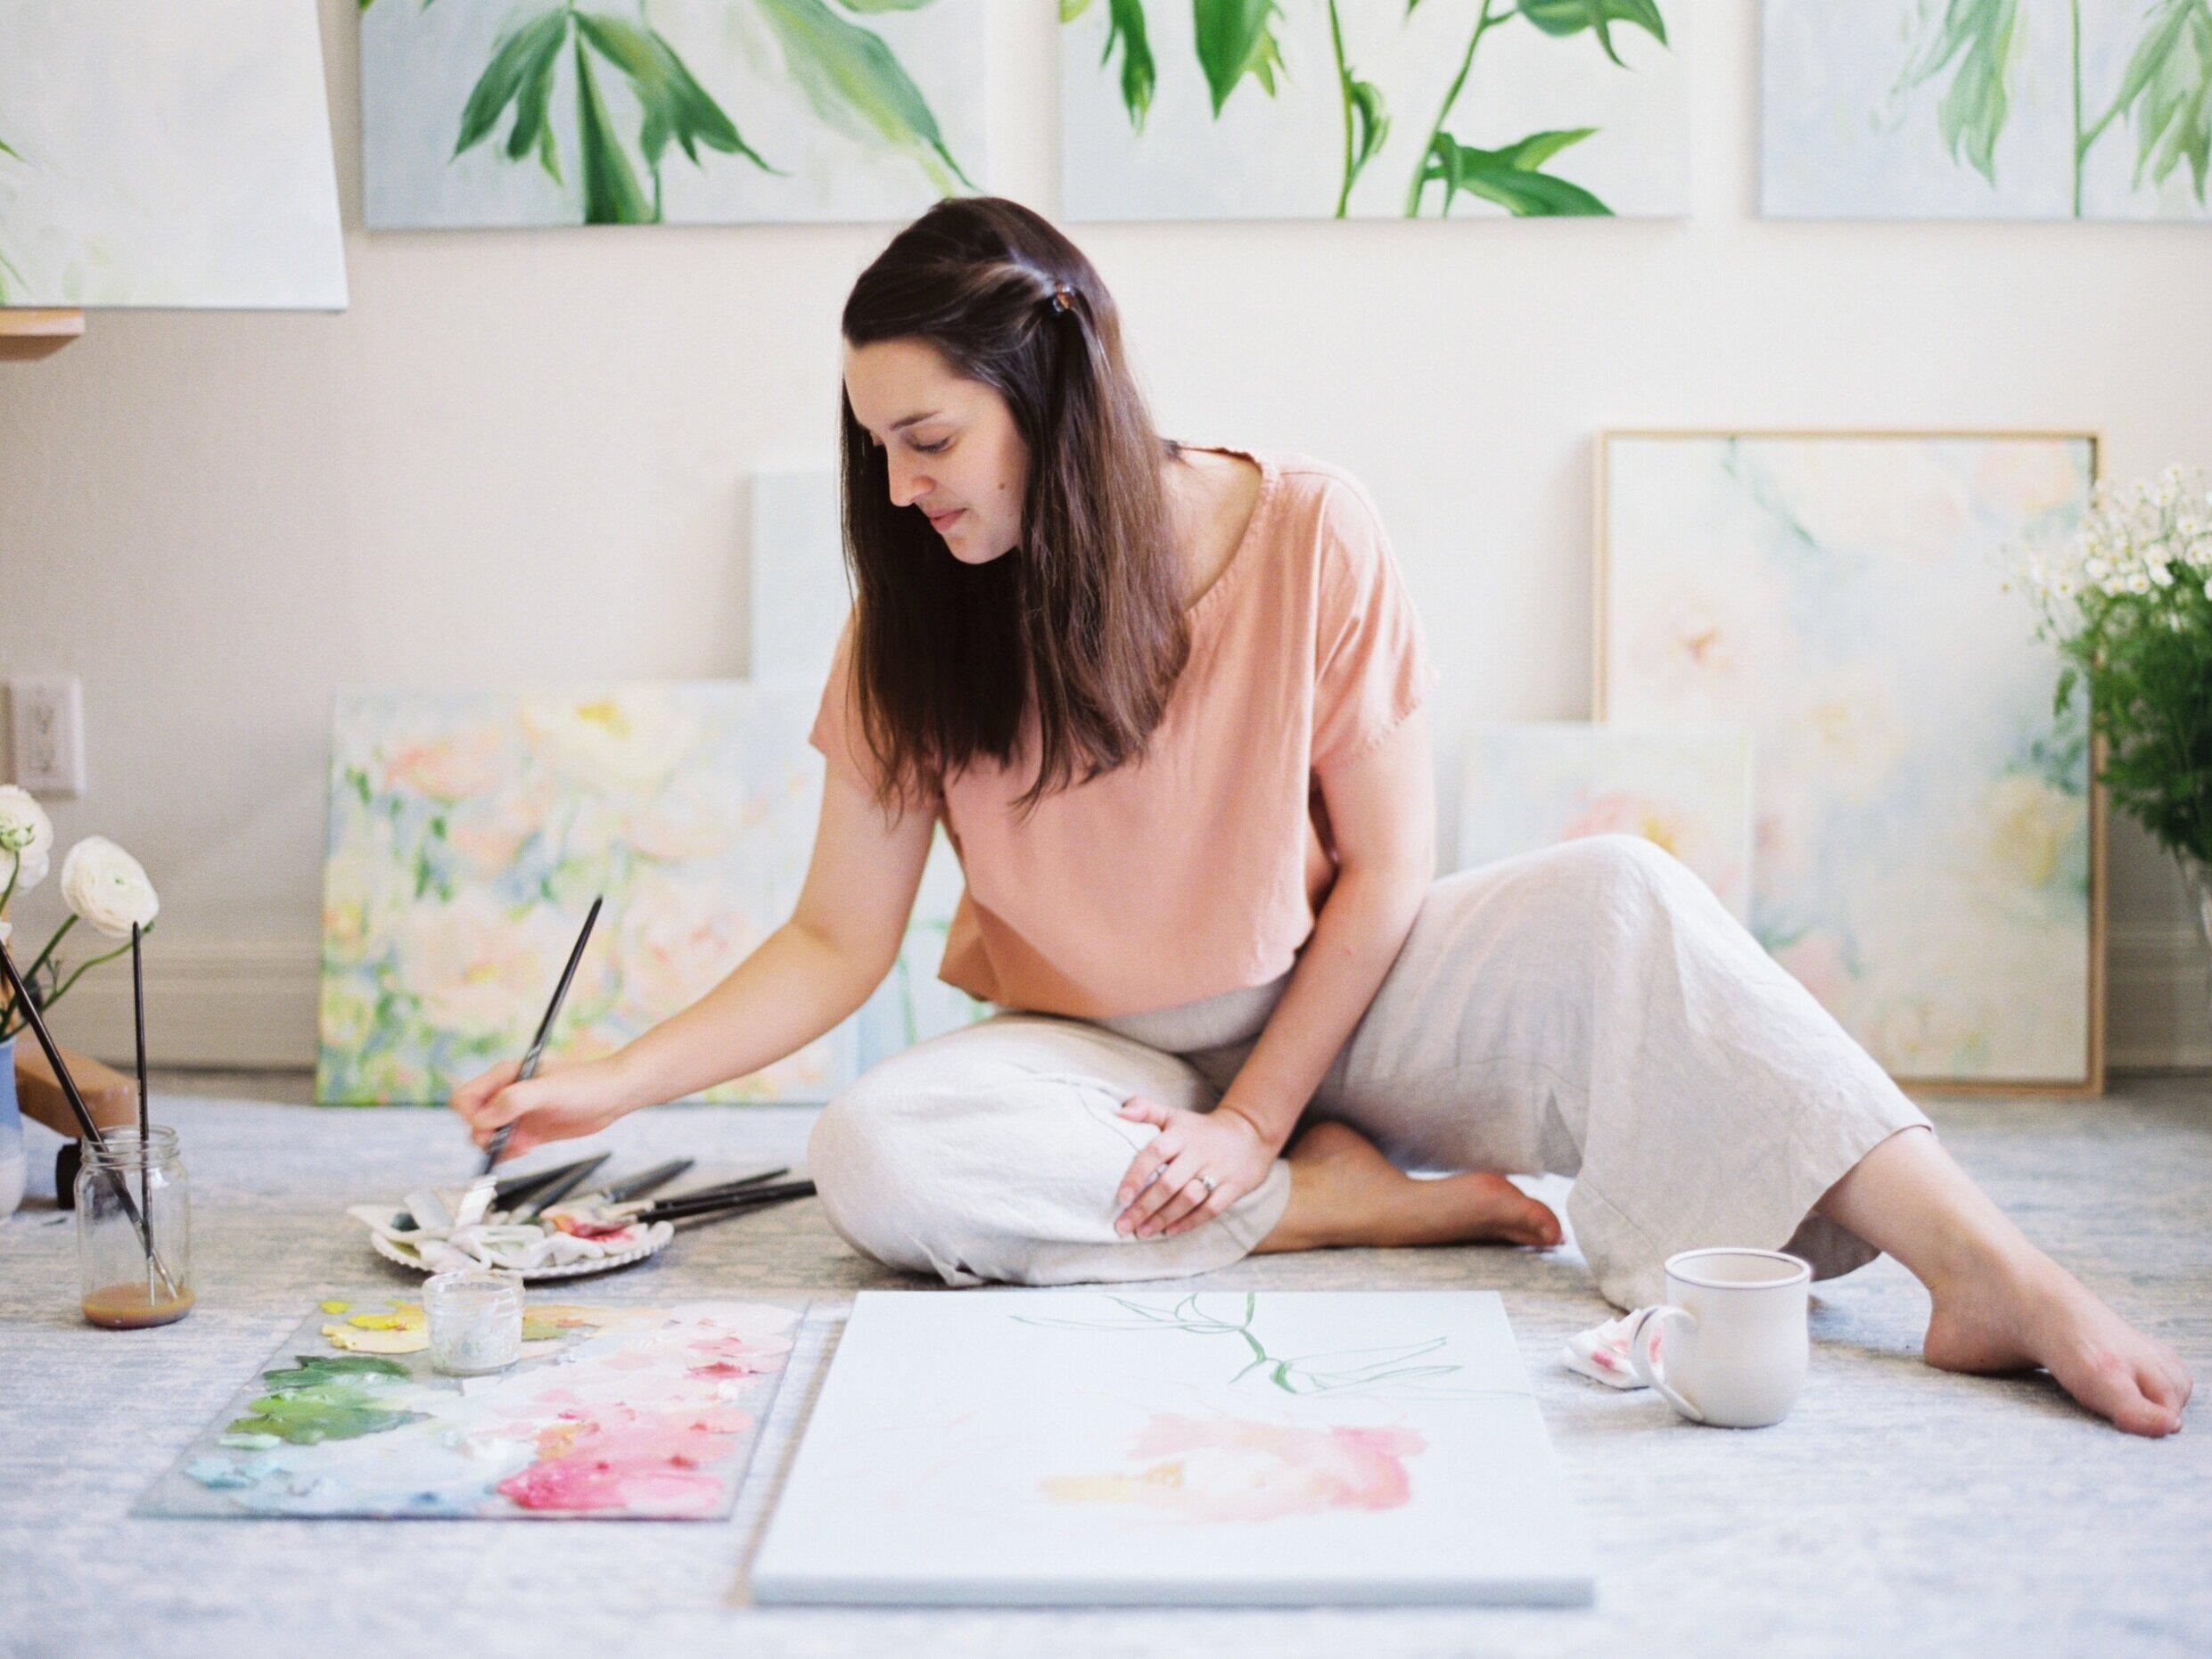 MICHELLE BOYD - Oil Painter